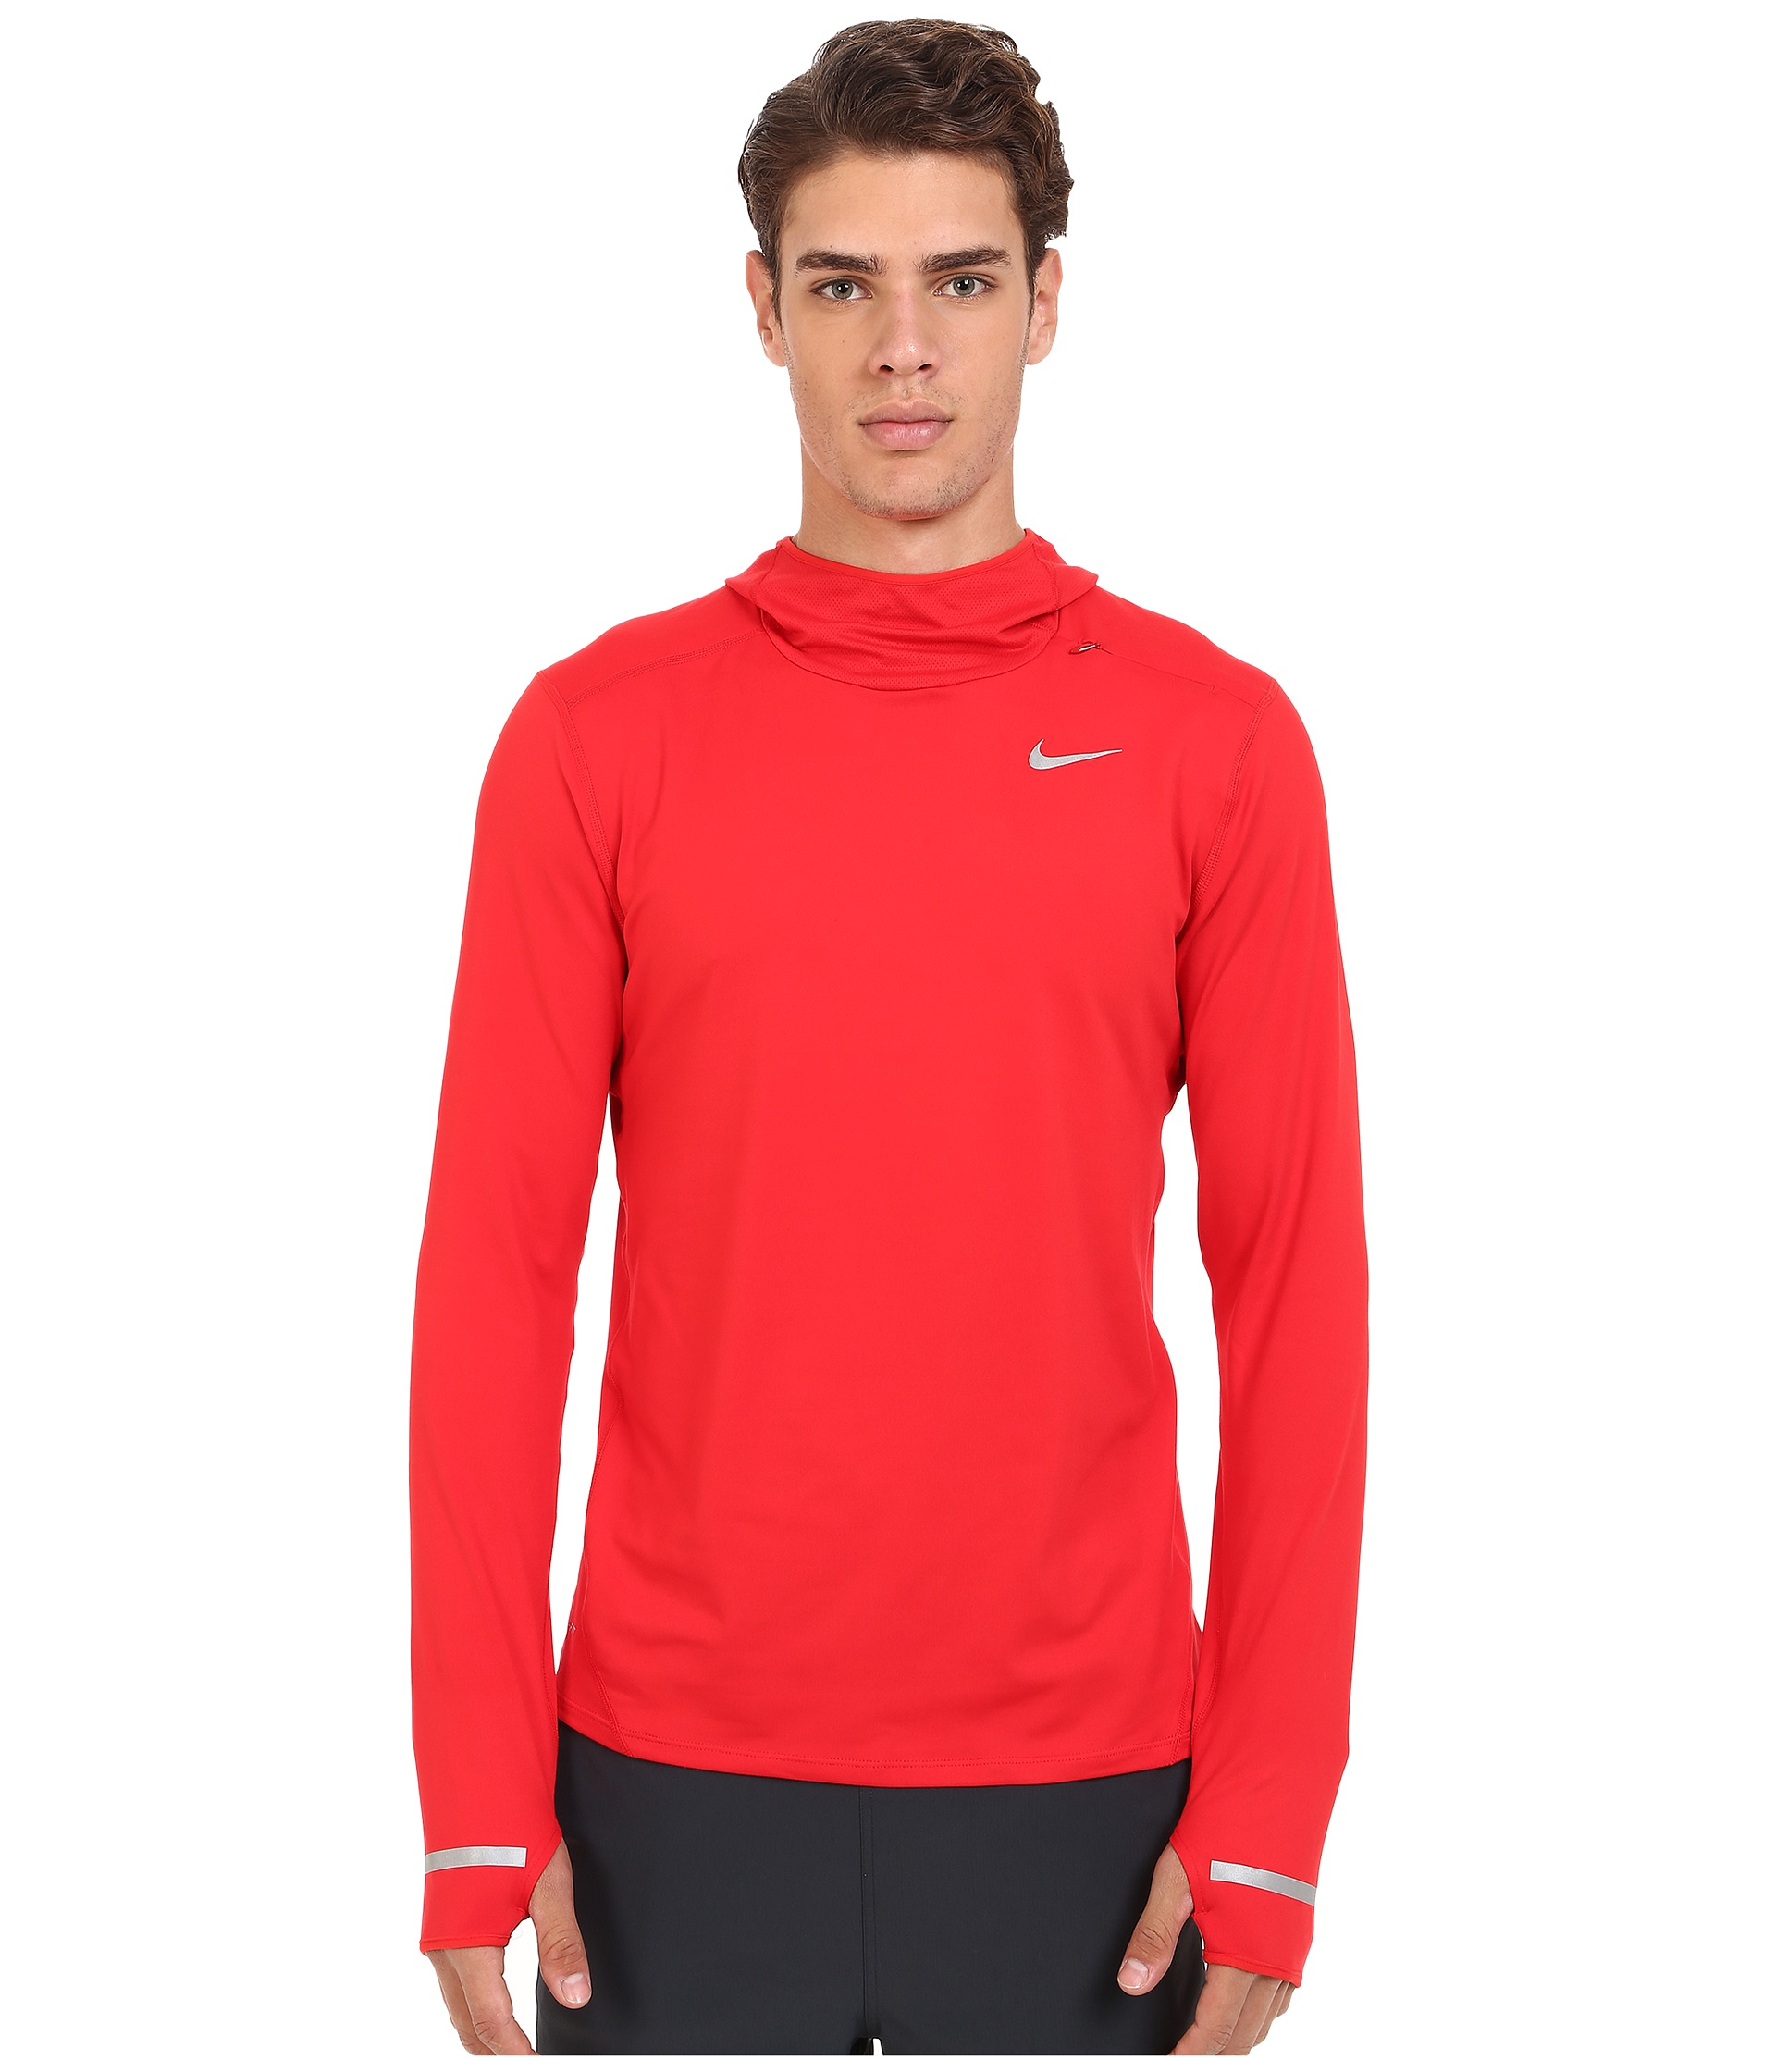 Nike element jacket men's - Nike Element Jacket Men's 42